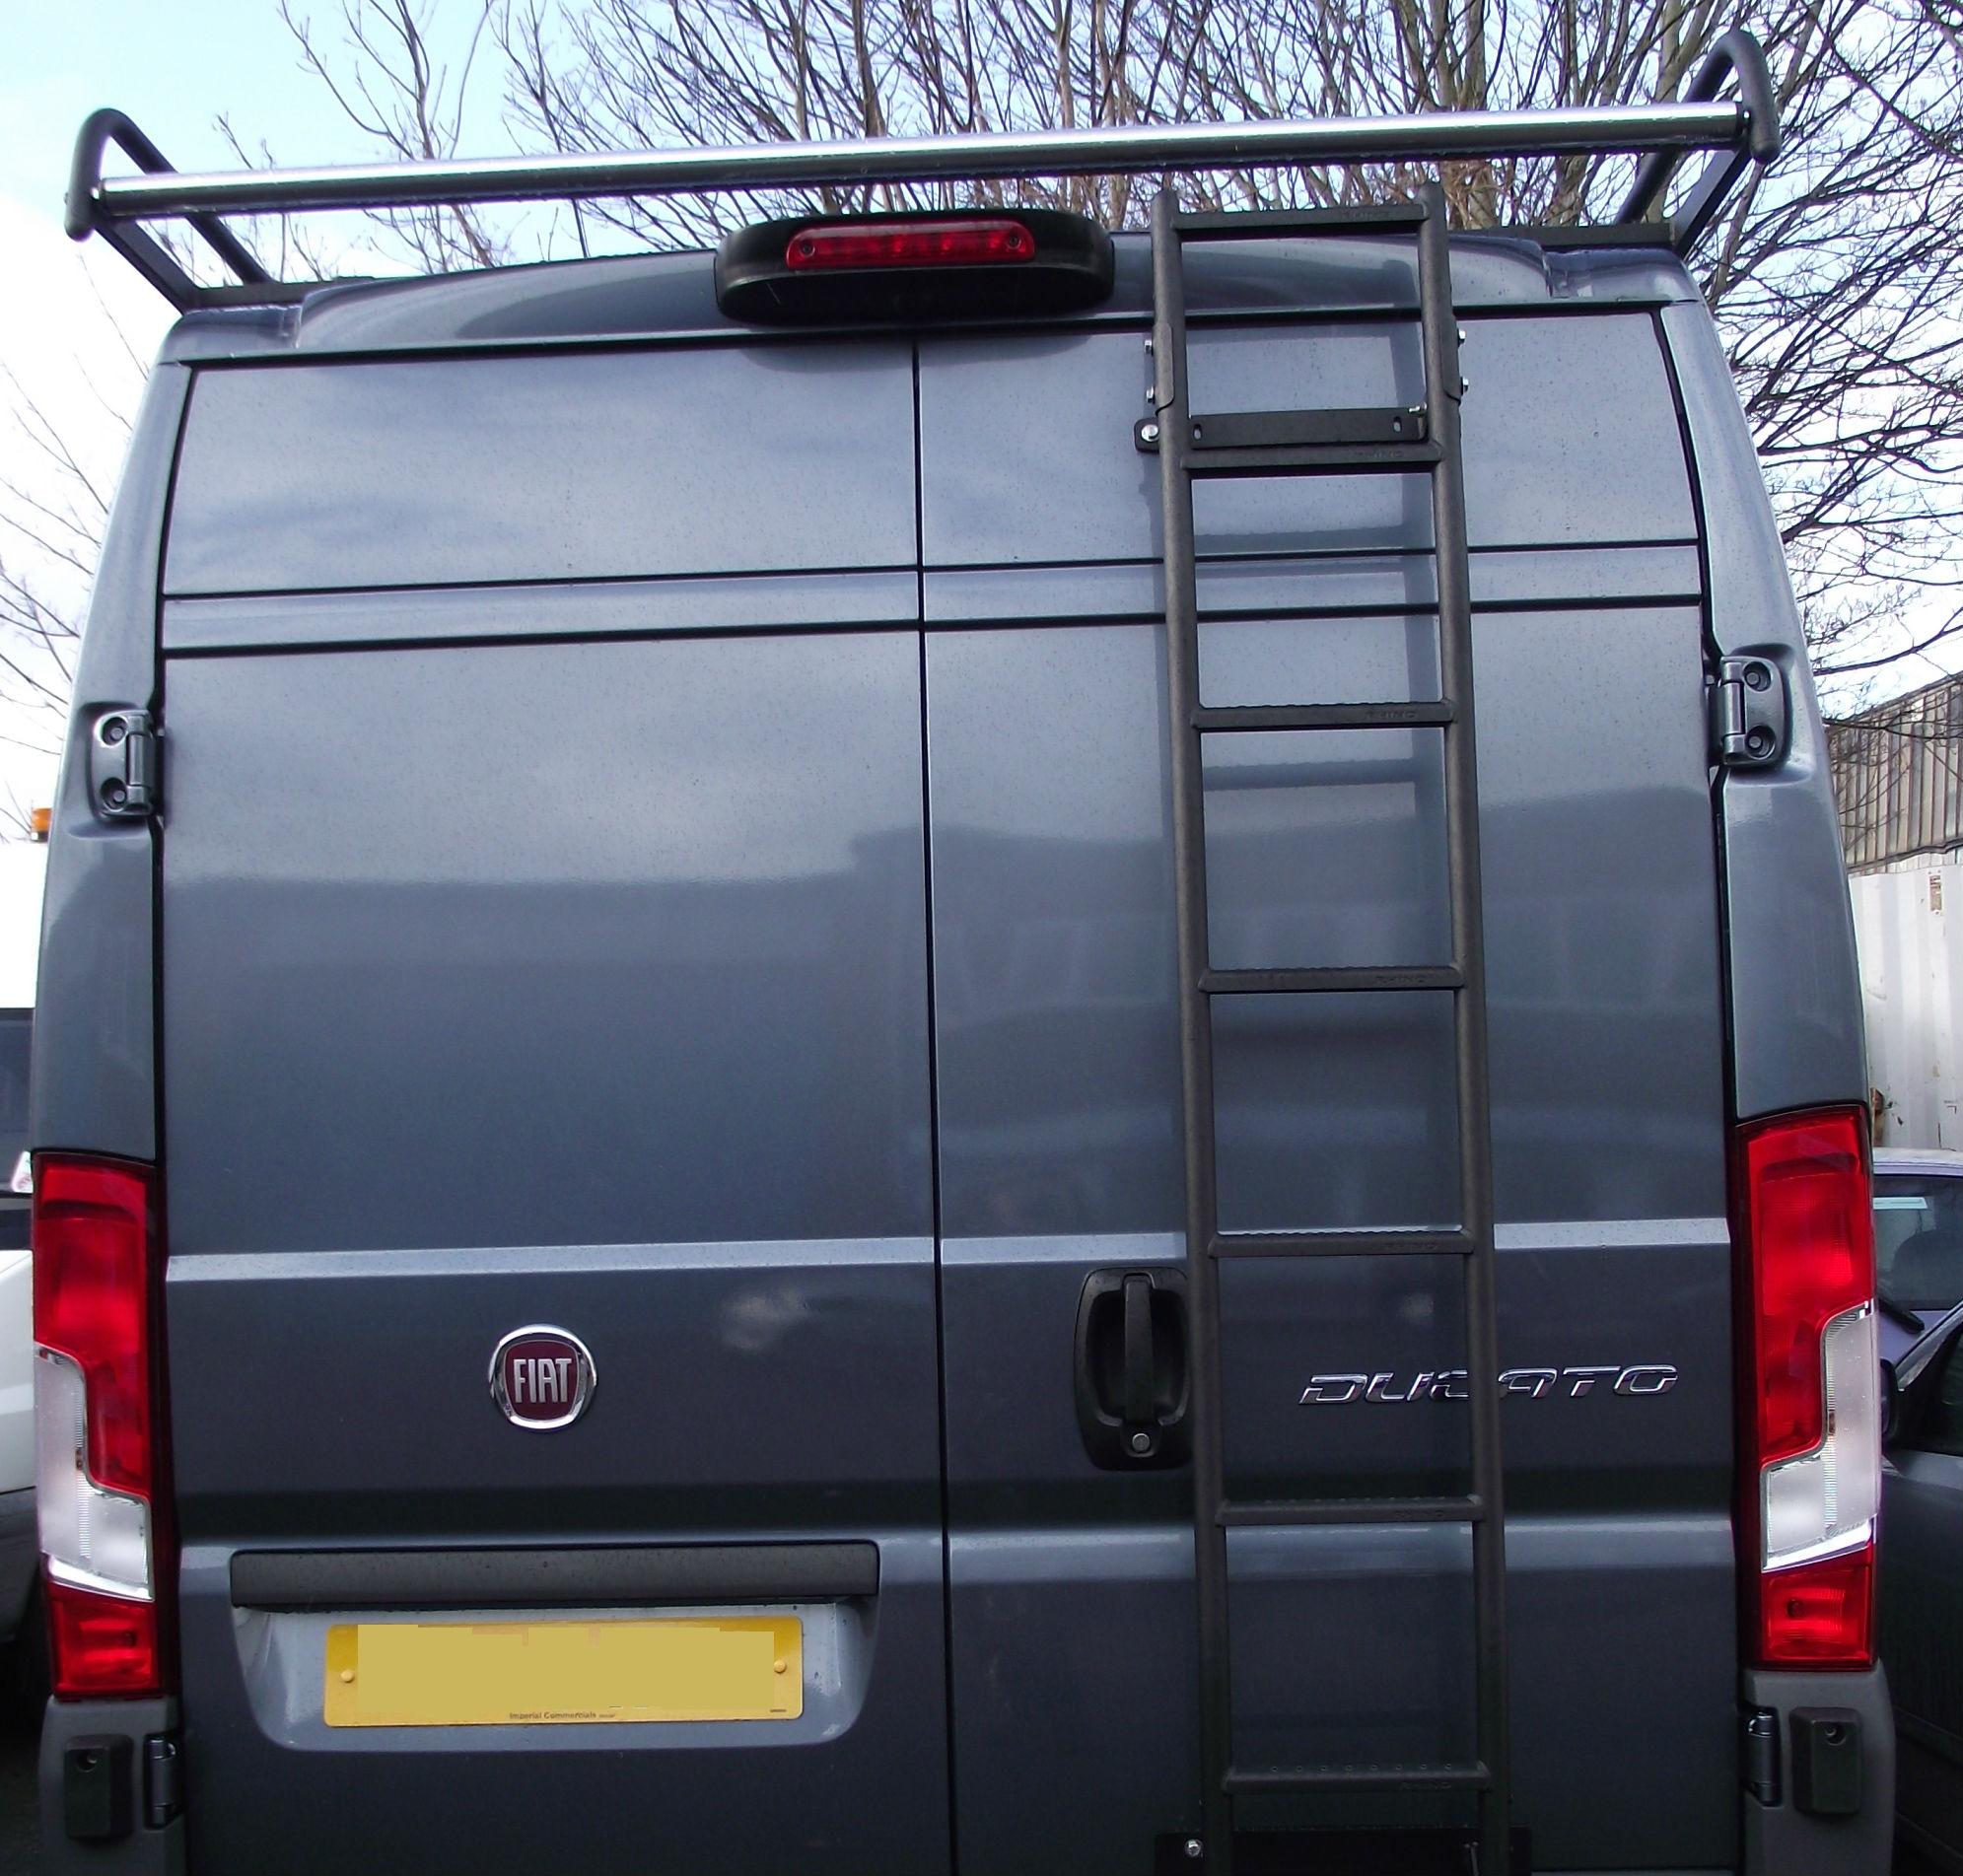 Fiat-Ducato-Mod-Rack-and-Rear-Door-Ladder-3.JPG